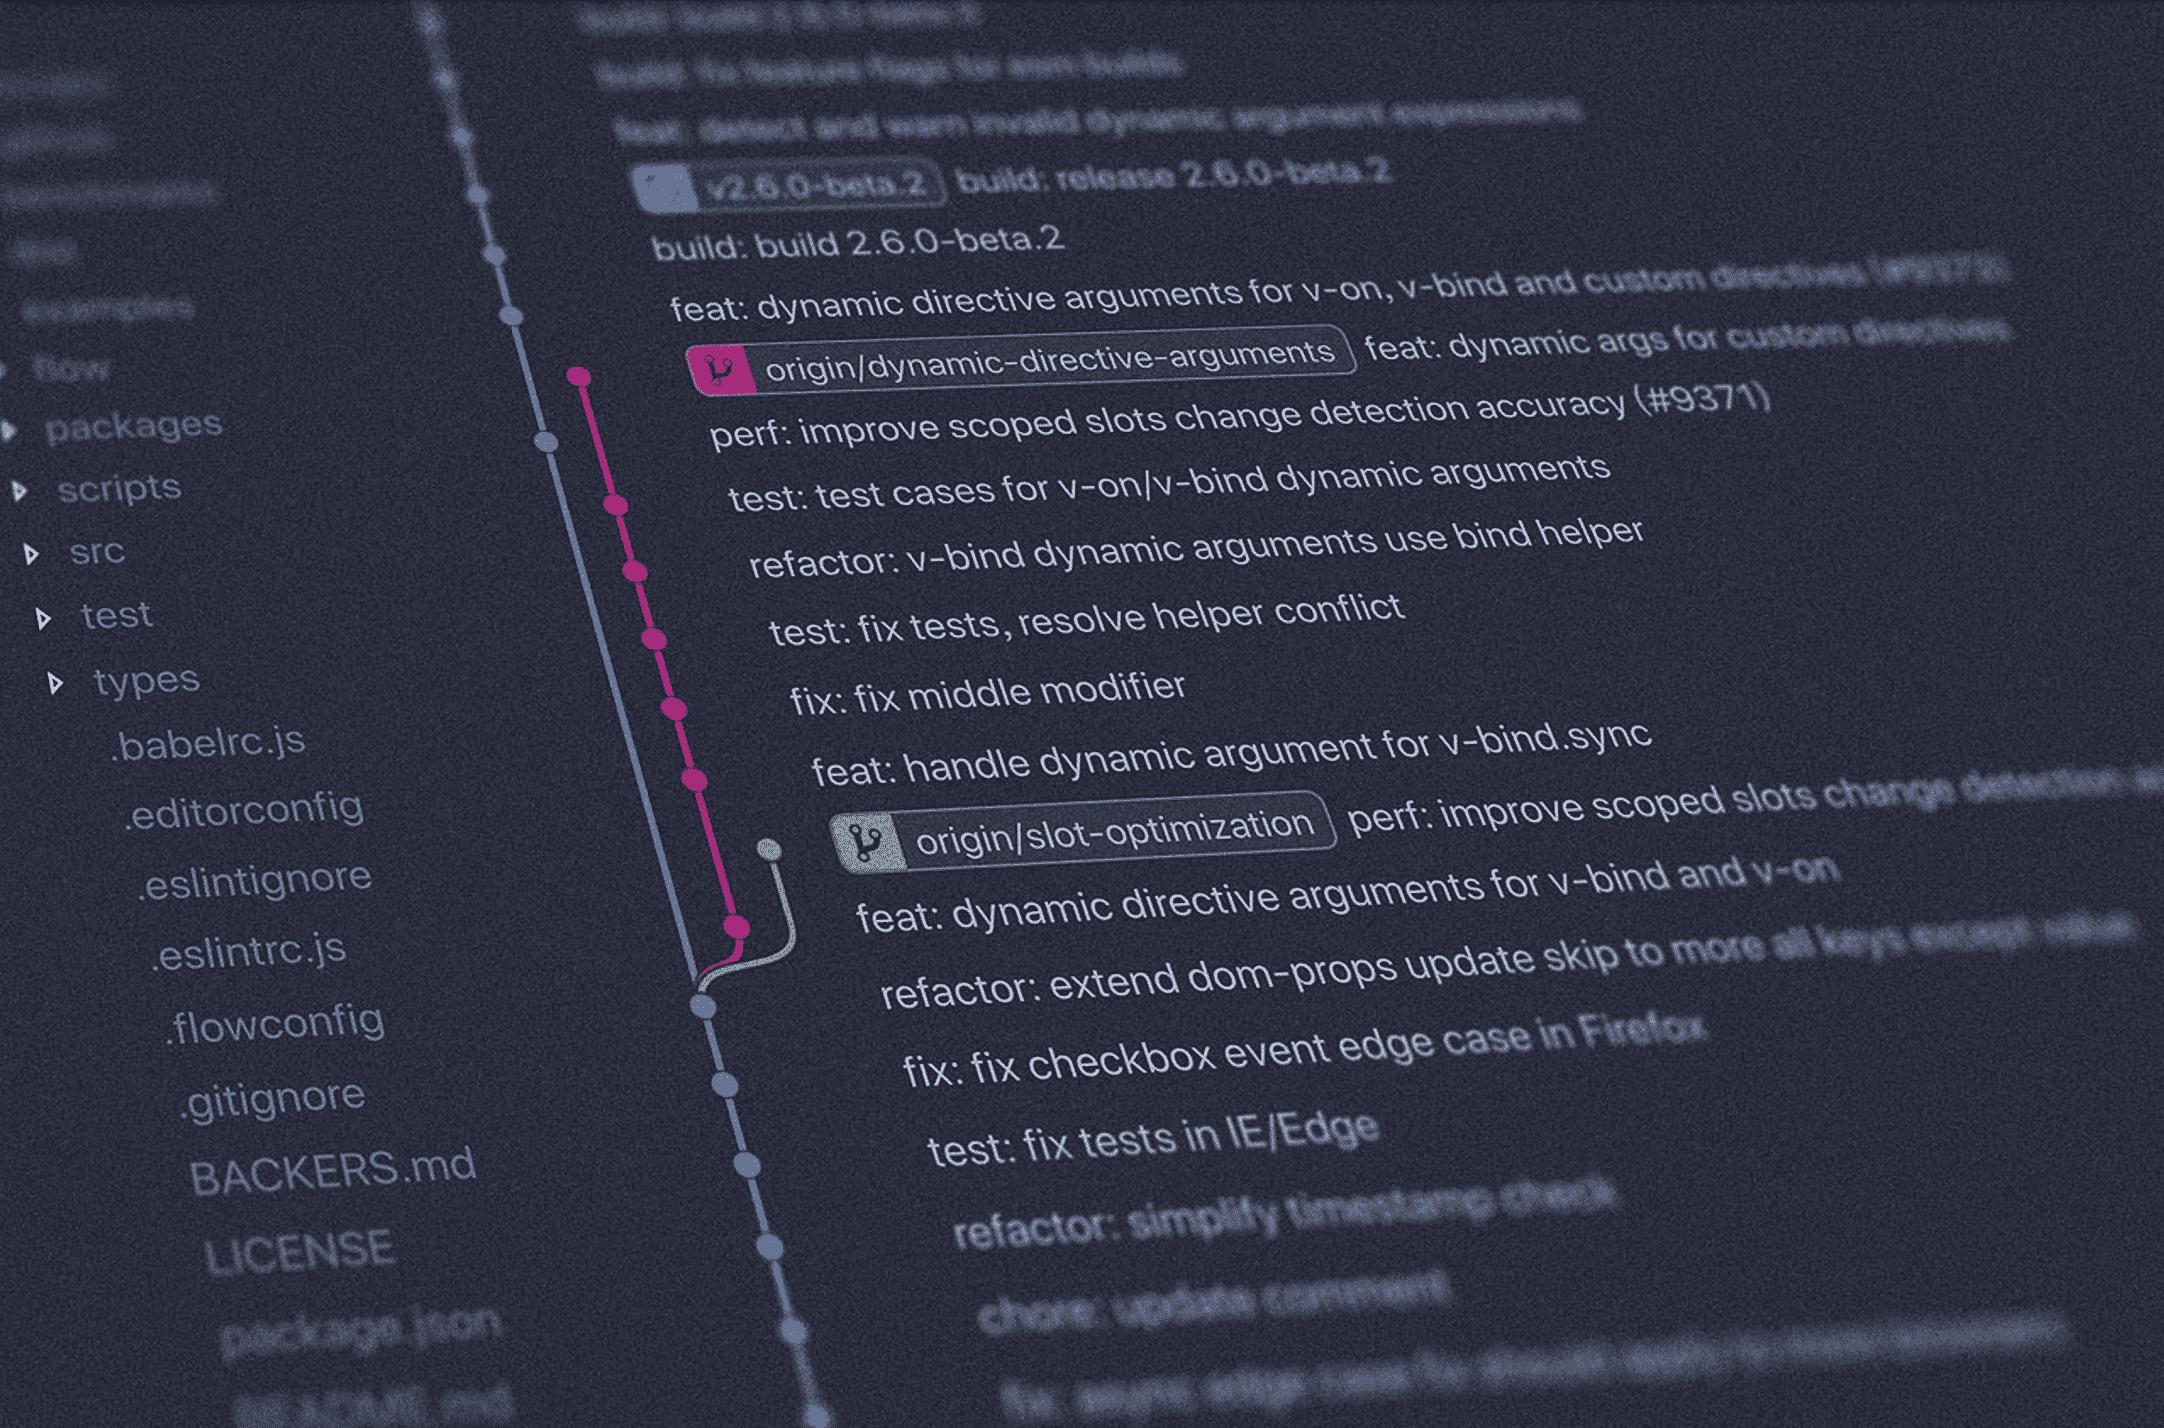 How to backup GitHub repository?